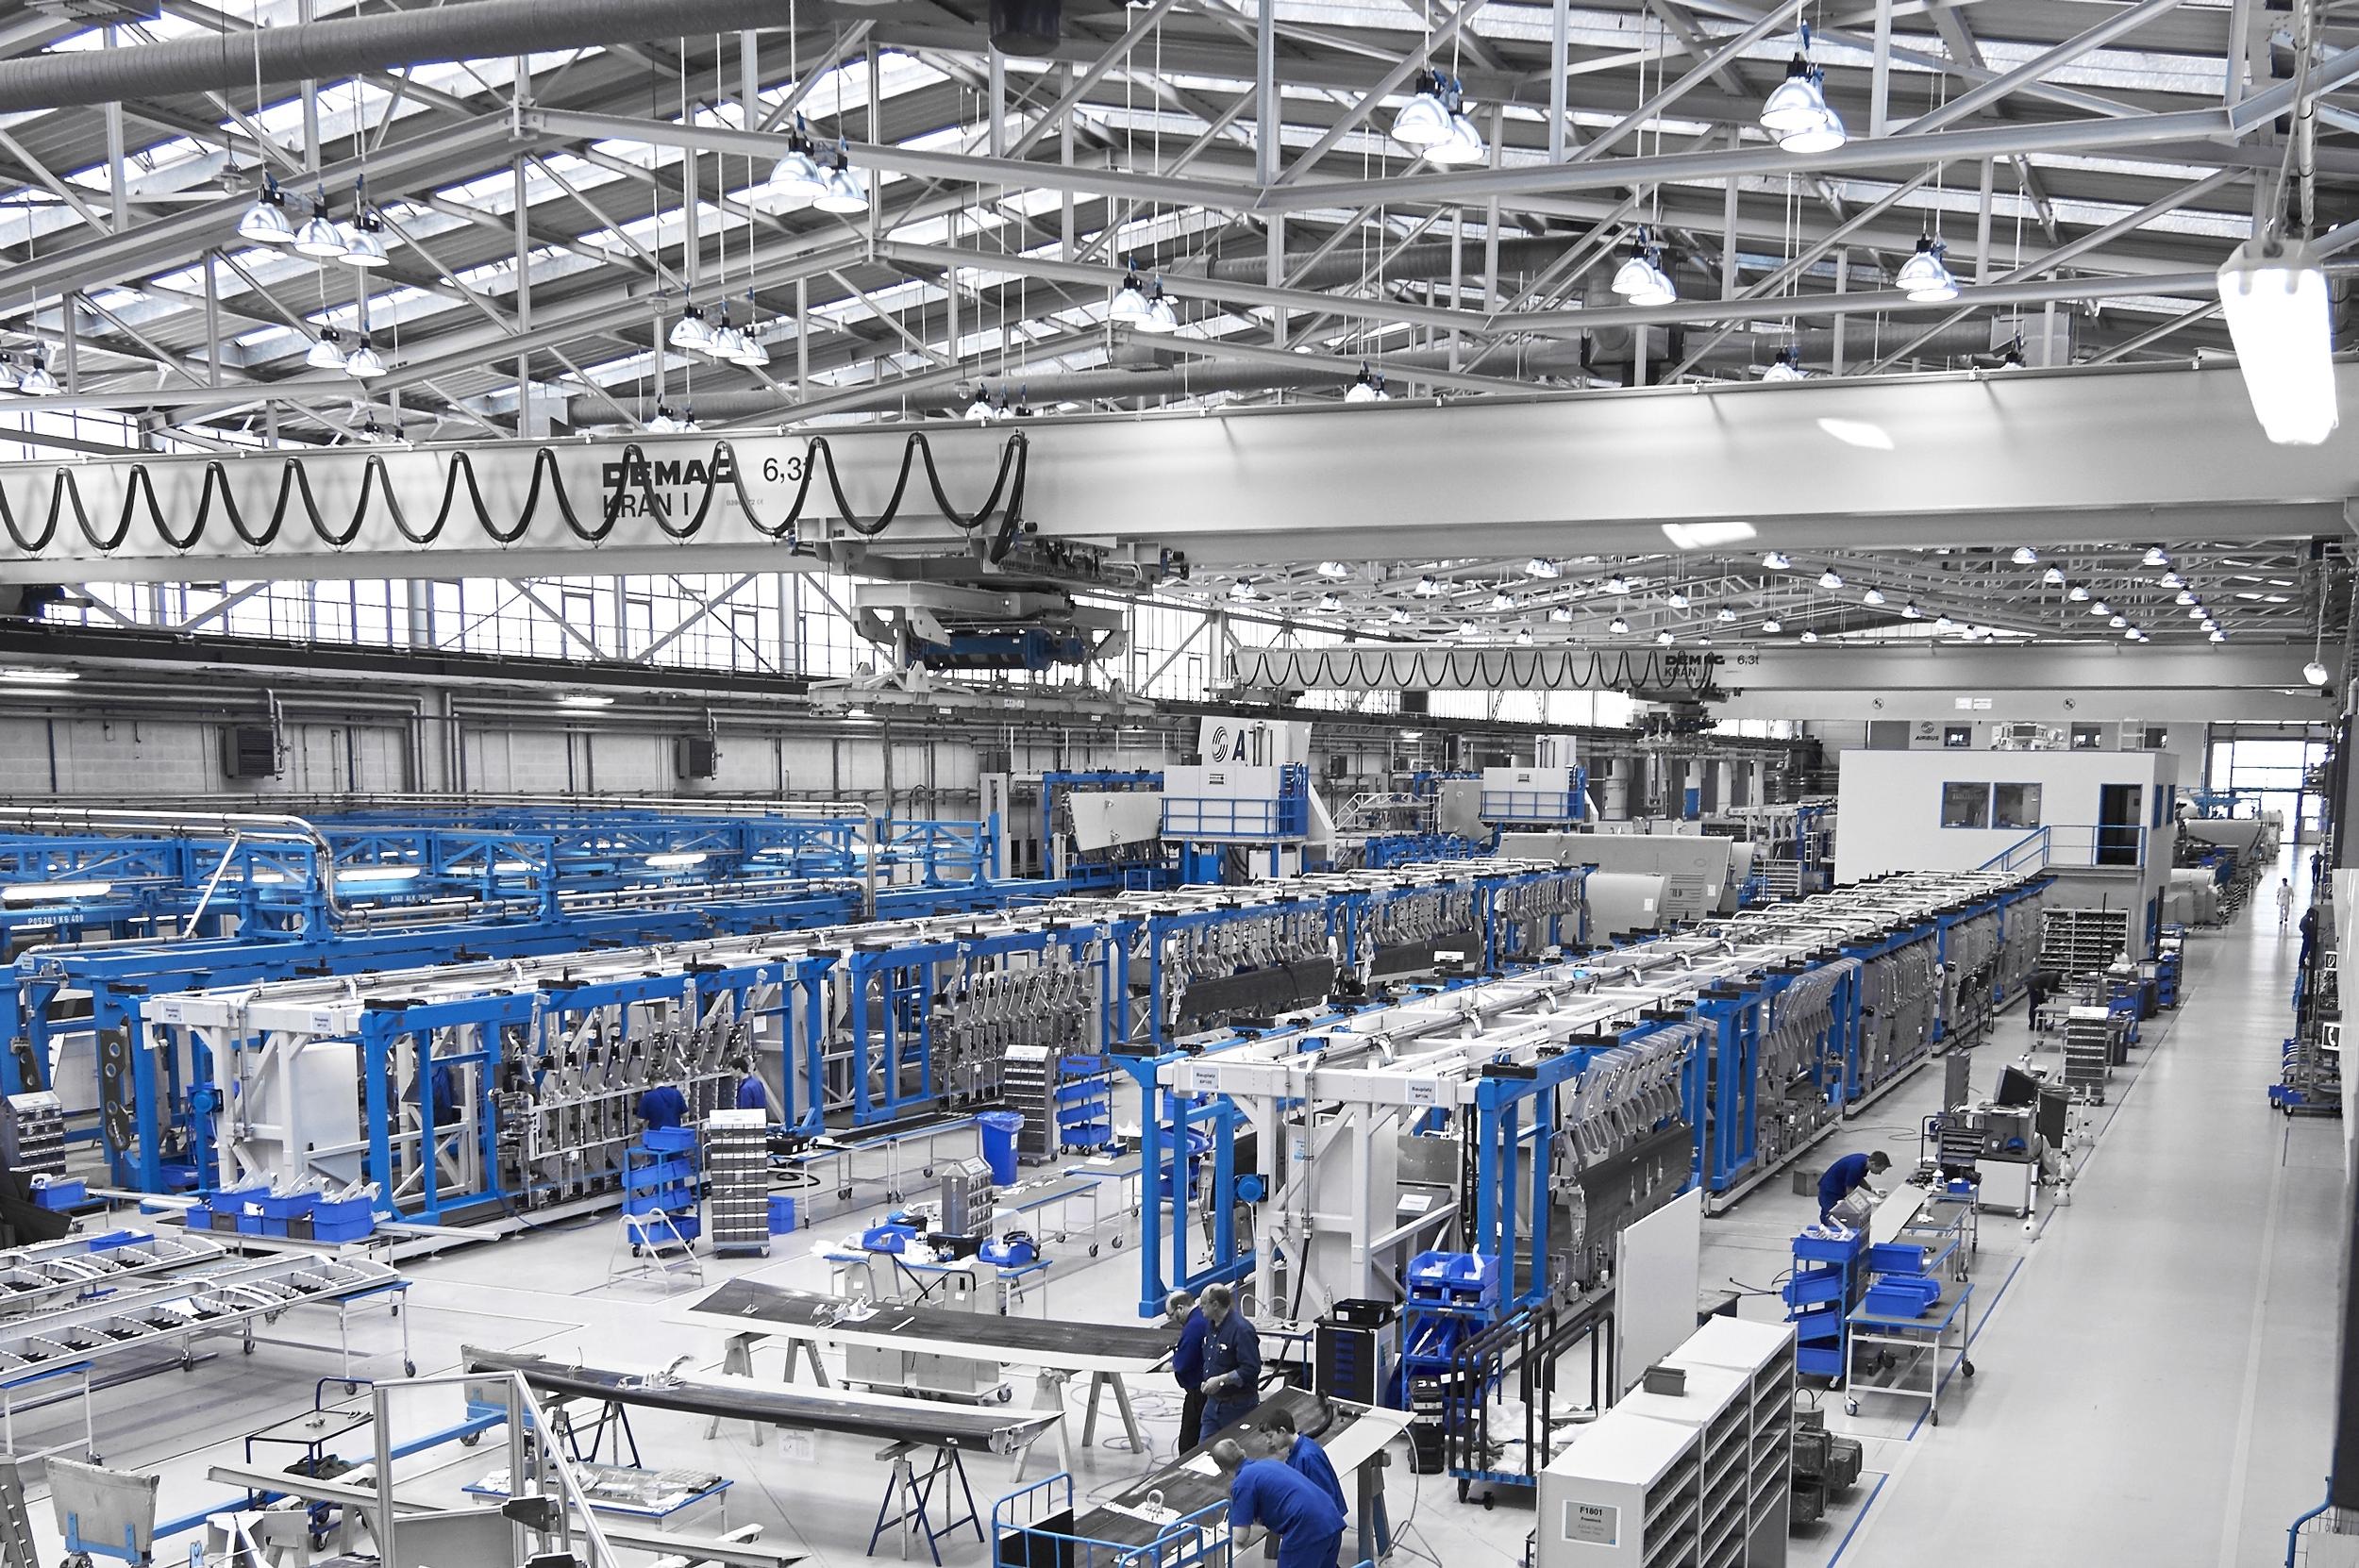 Industriefotograf, Industriefotografie Lübeck, Industriefotograf Lübeck, Hamburg, Vechta, Köln, Dortmund, Stuttgart, Rostock, Wismar, Berlin